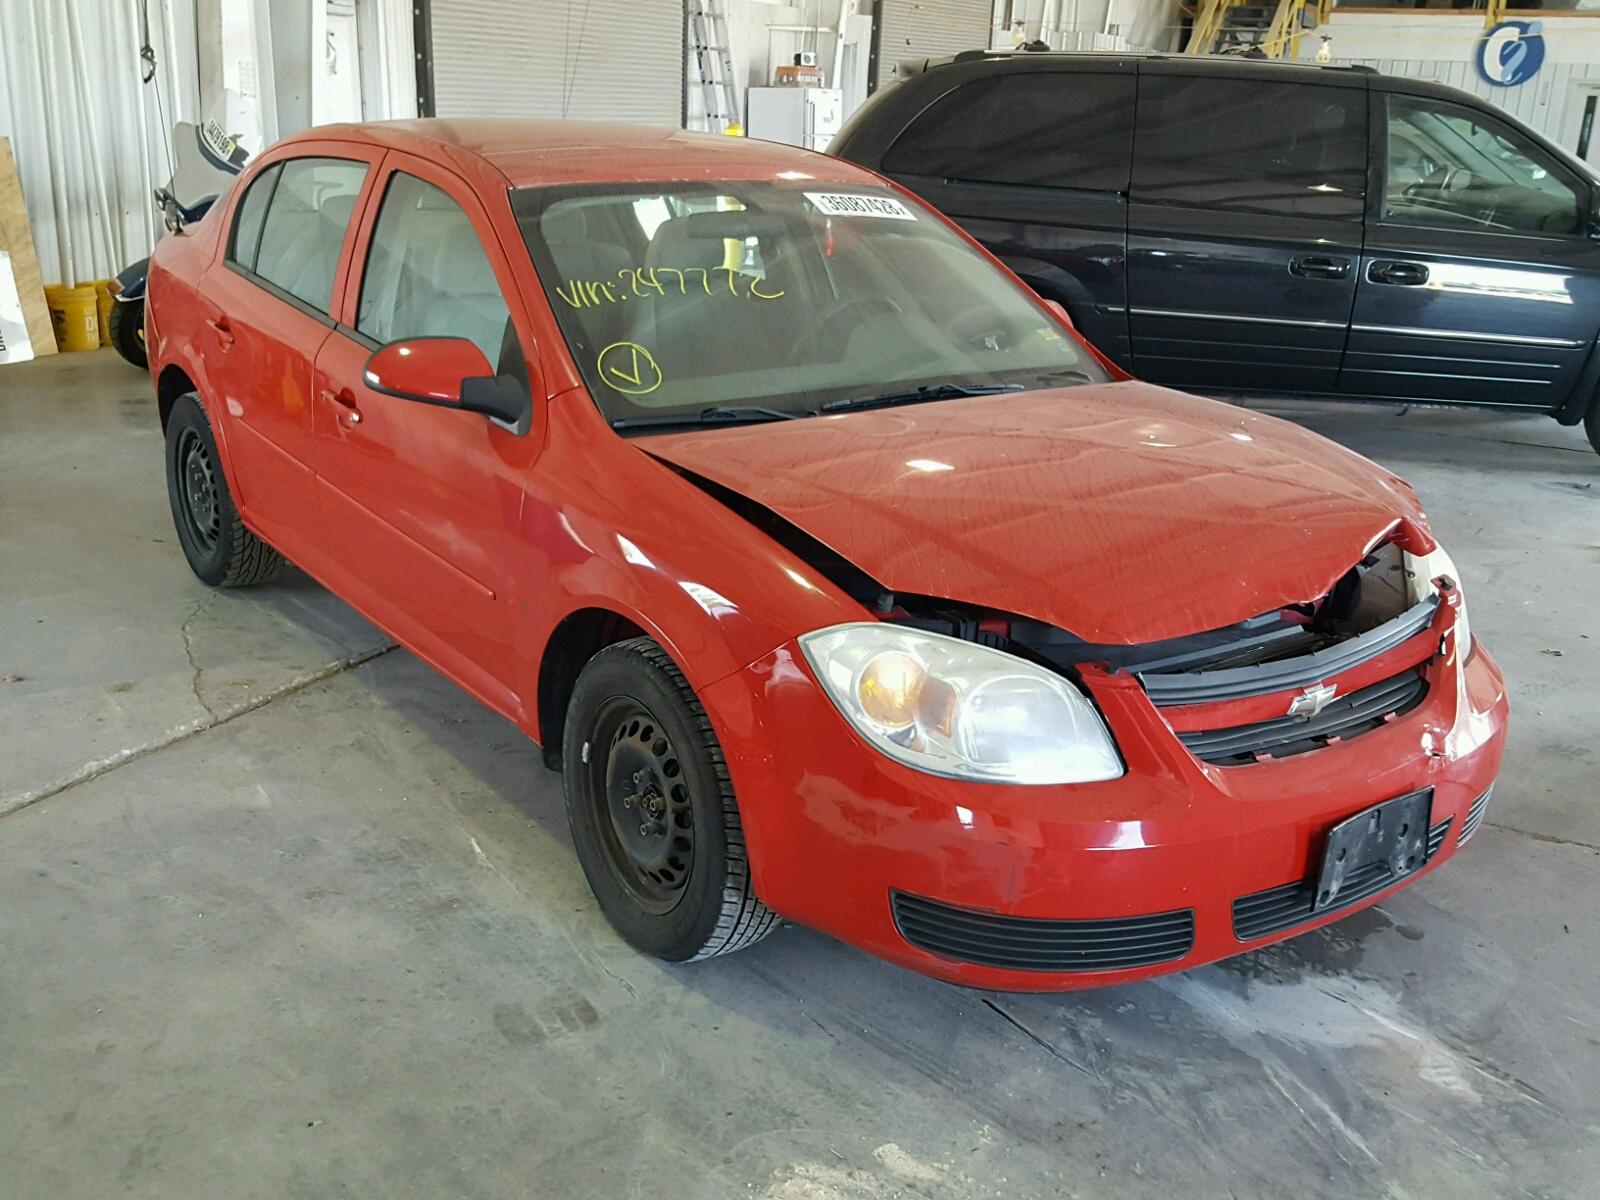 Salvage 2007 Chevrolet COBALT LT for sale